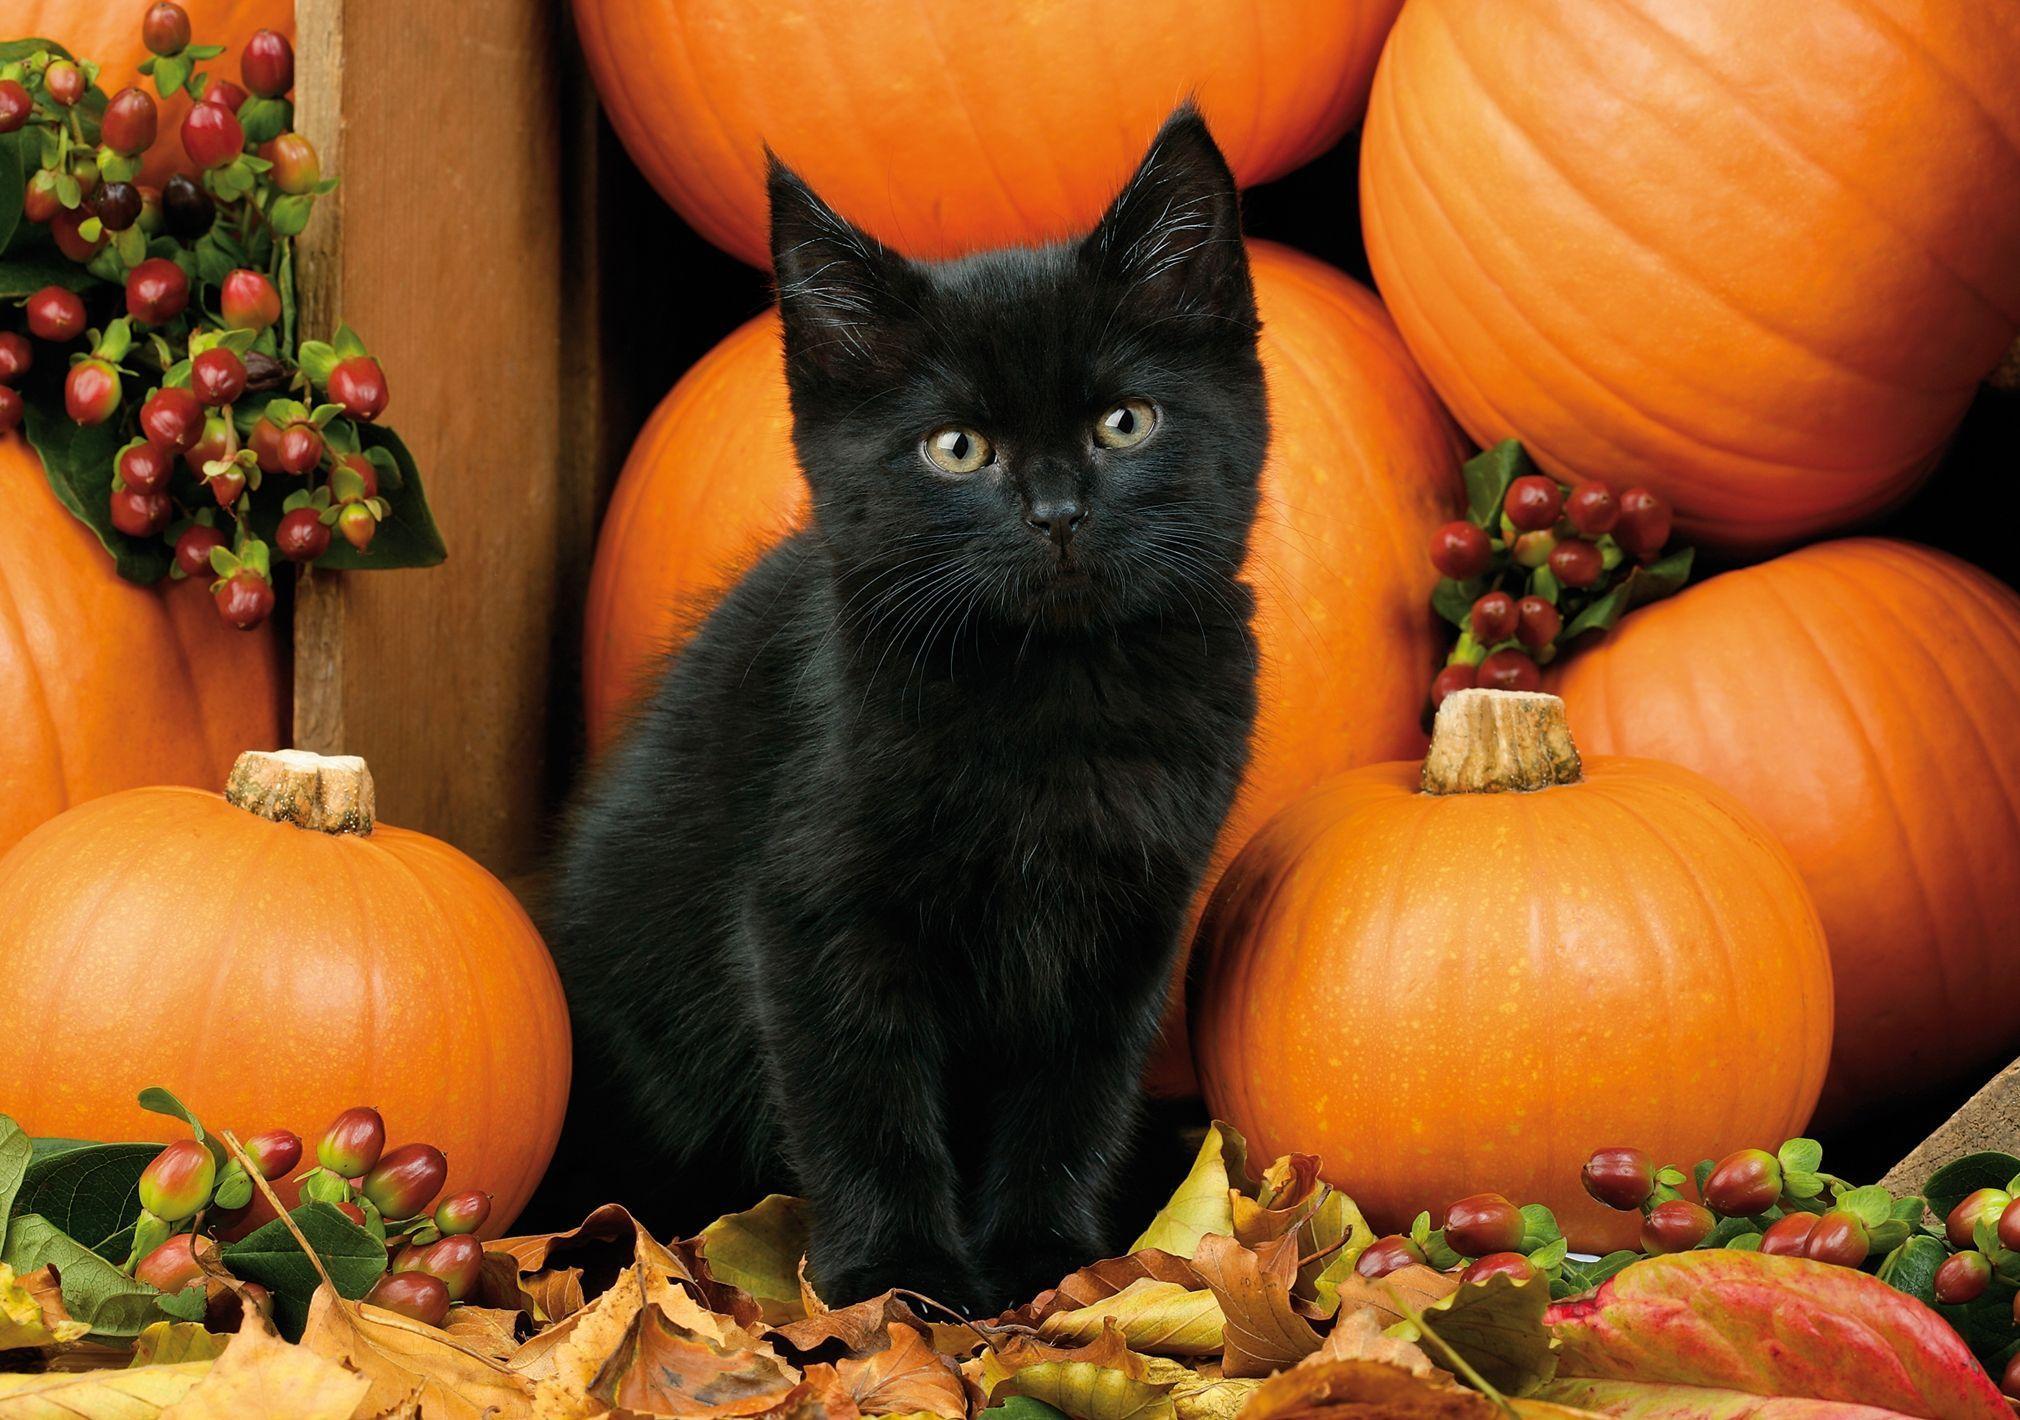 Cute Black Cat Halloween Wallpapers Top Free Cute Black Cat Halloween Backgrounds Wallpaperaccess